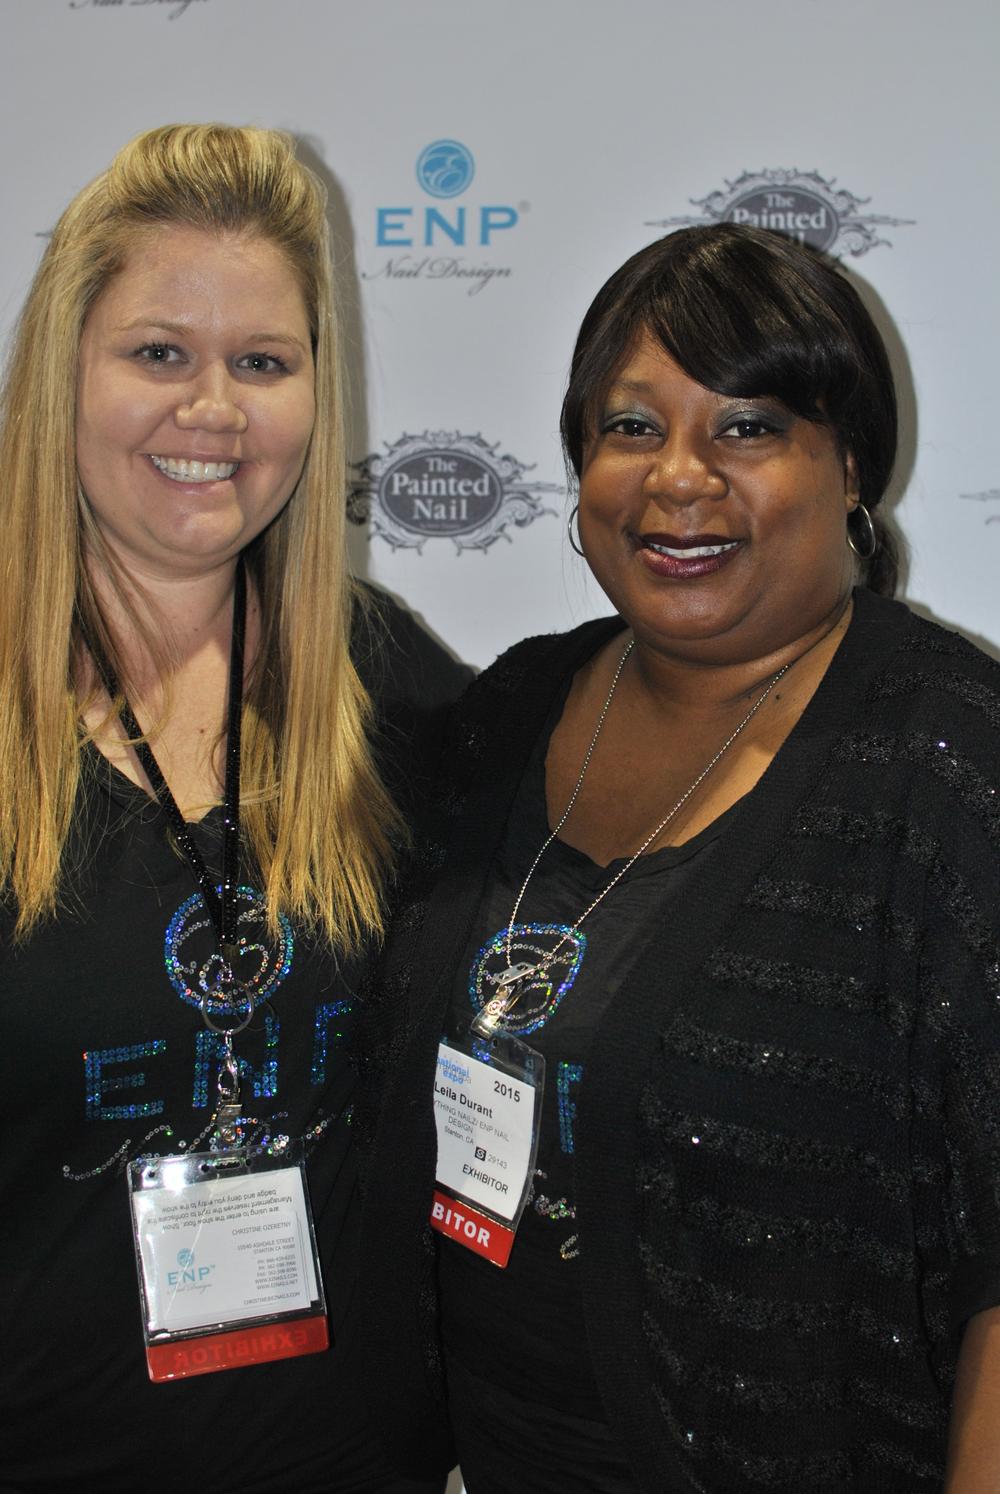 <p>ENP's duo Christine Ozeretny and Leila Durant</p>